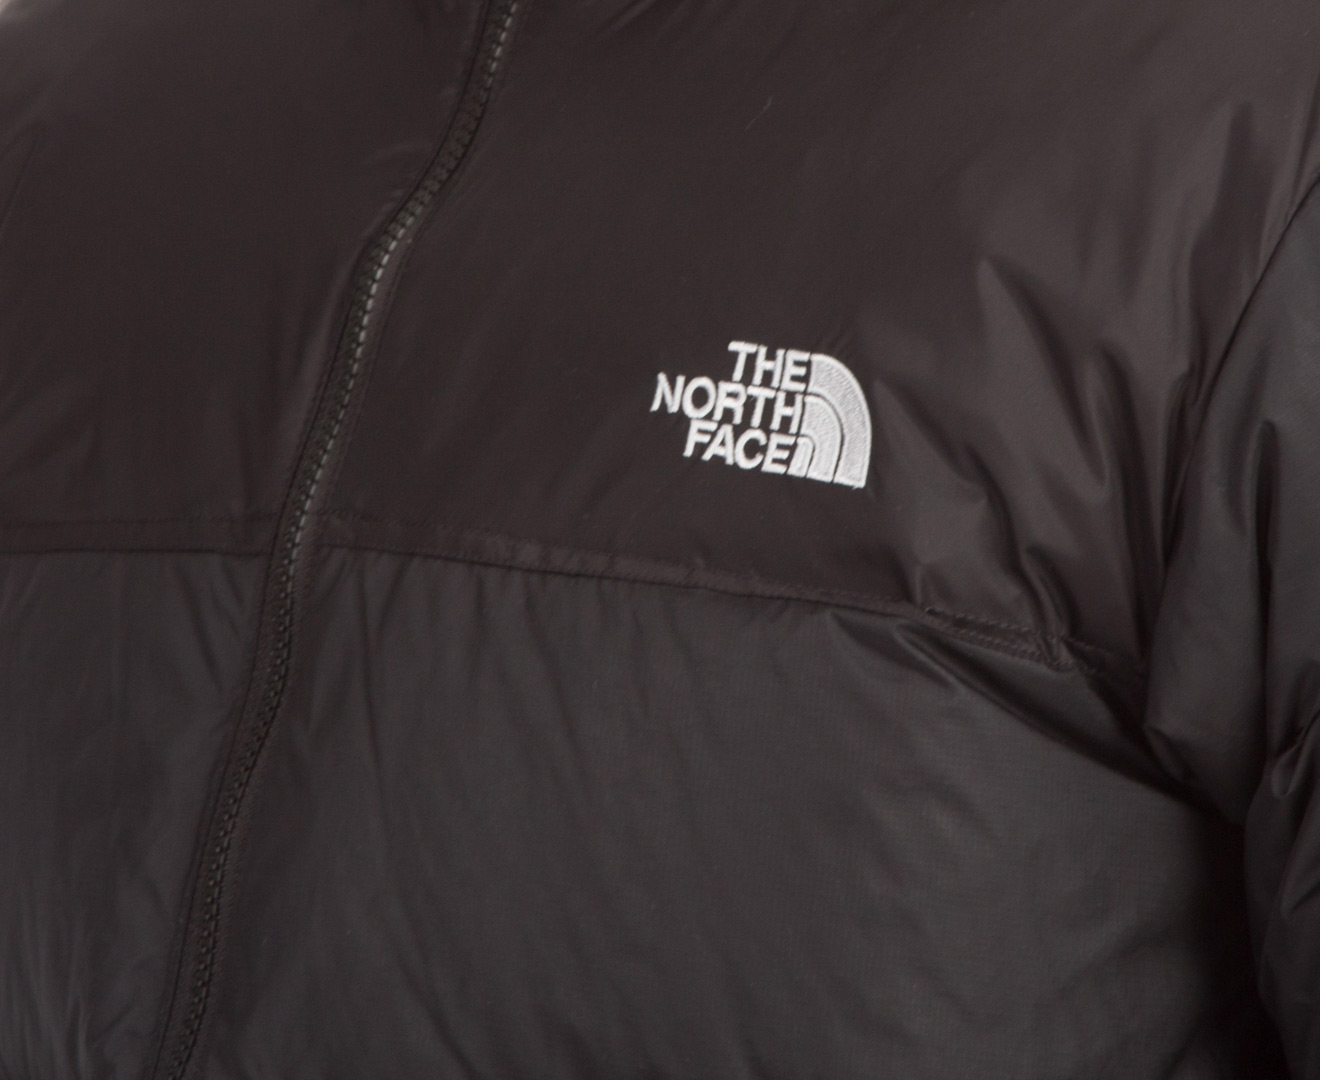 7aef32b0220f The North Face Men s Nuptse Jacket - Black